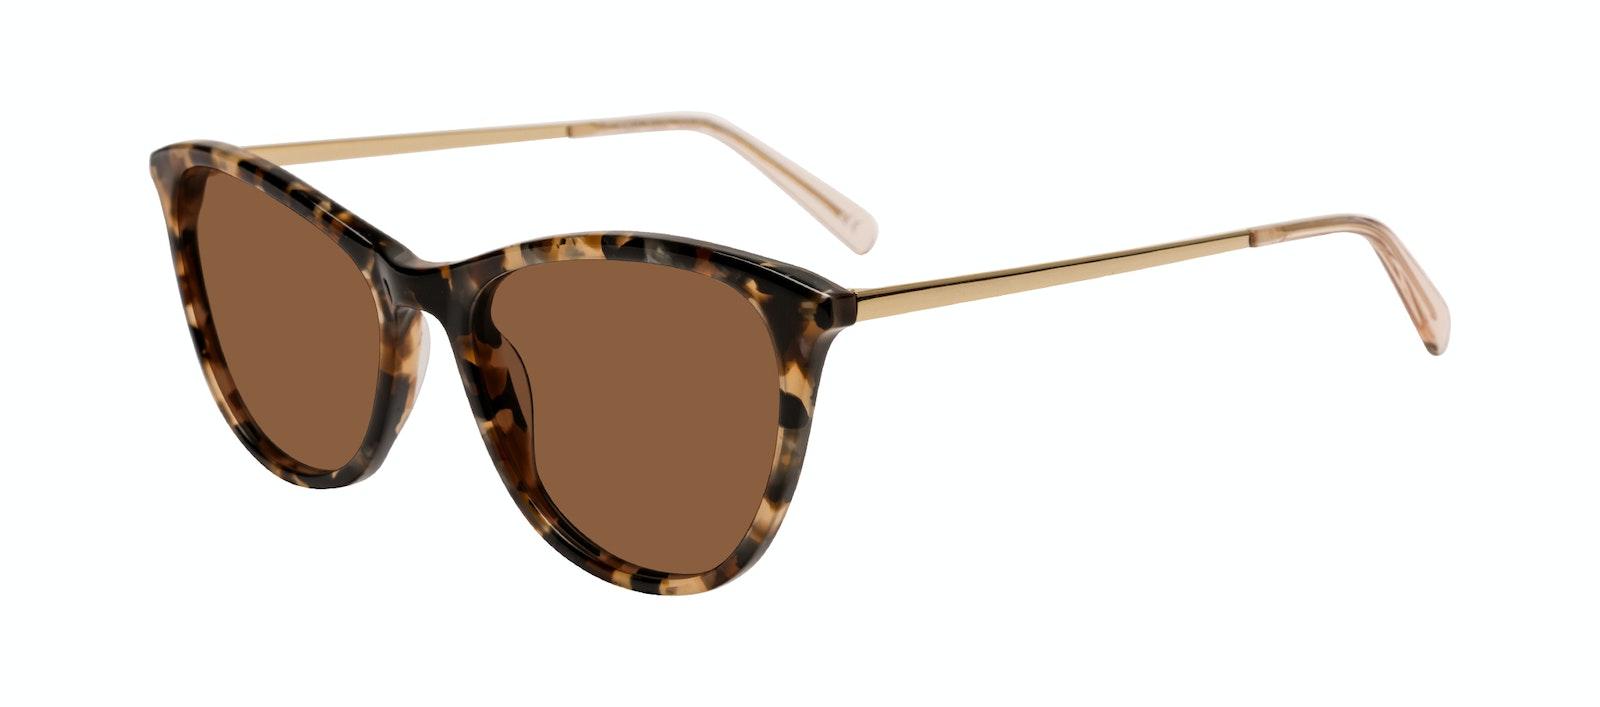 Affordable Fashion Glasses Rectangle Sunglasses Women Folk Plus Gold Flake Tilt